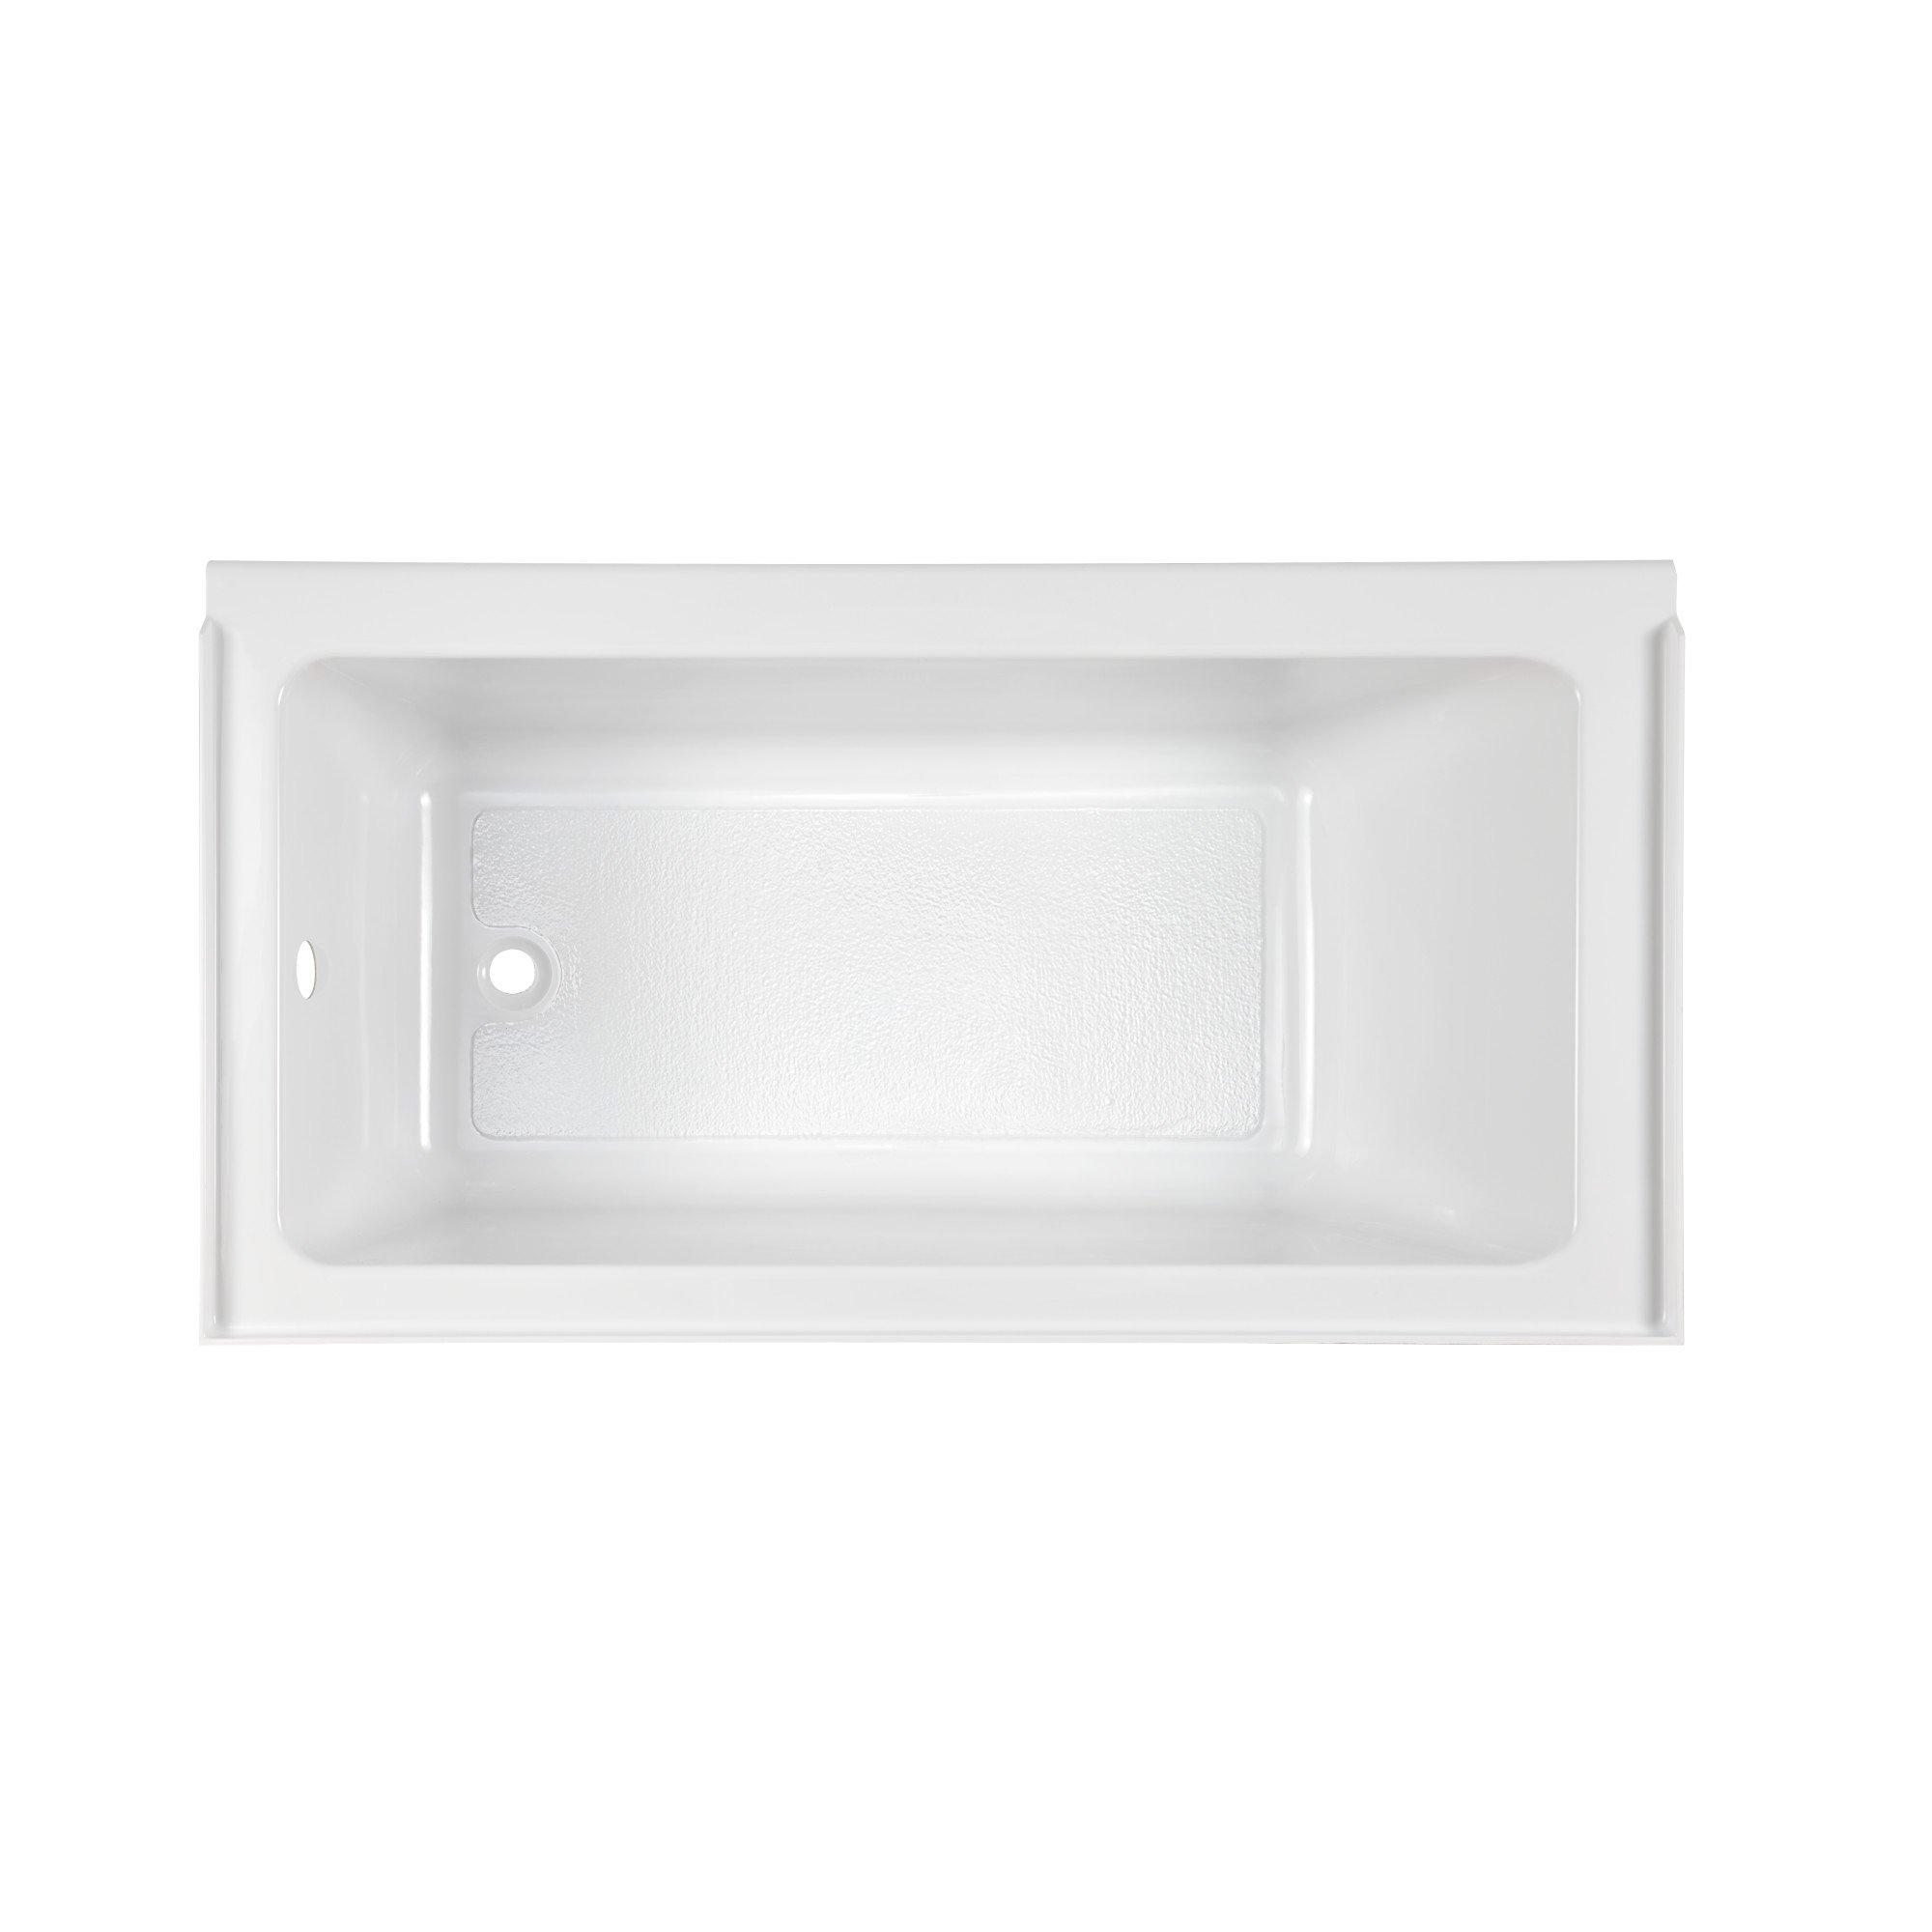 American Standard 2973212.011 Studio Fold Over Edge Tub Lho, 60'' x 30'', Arctic